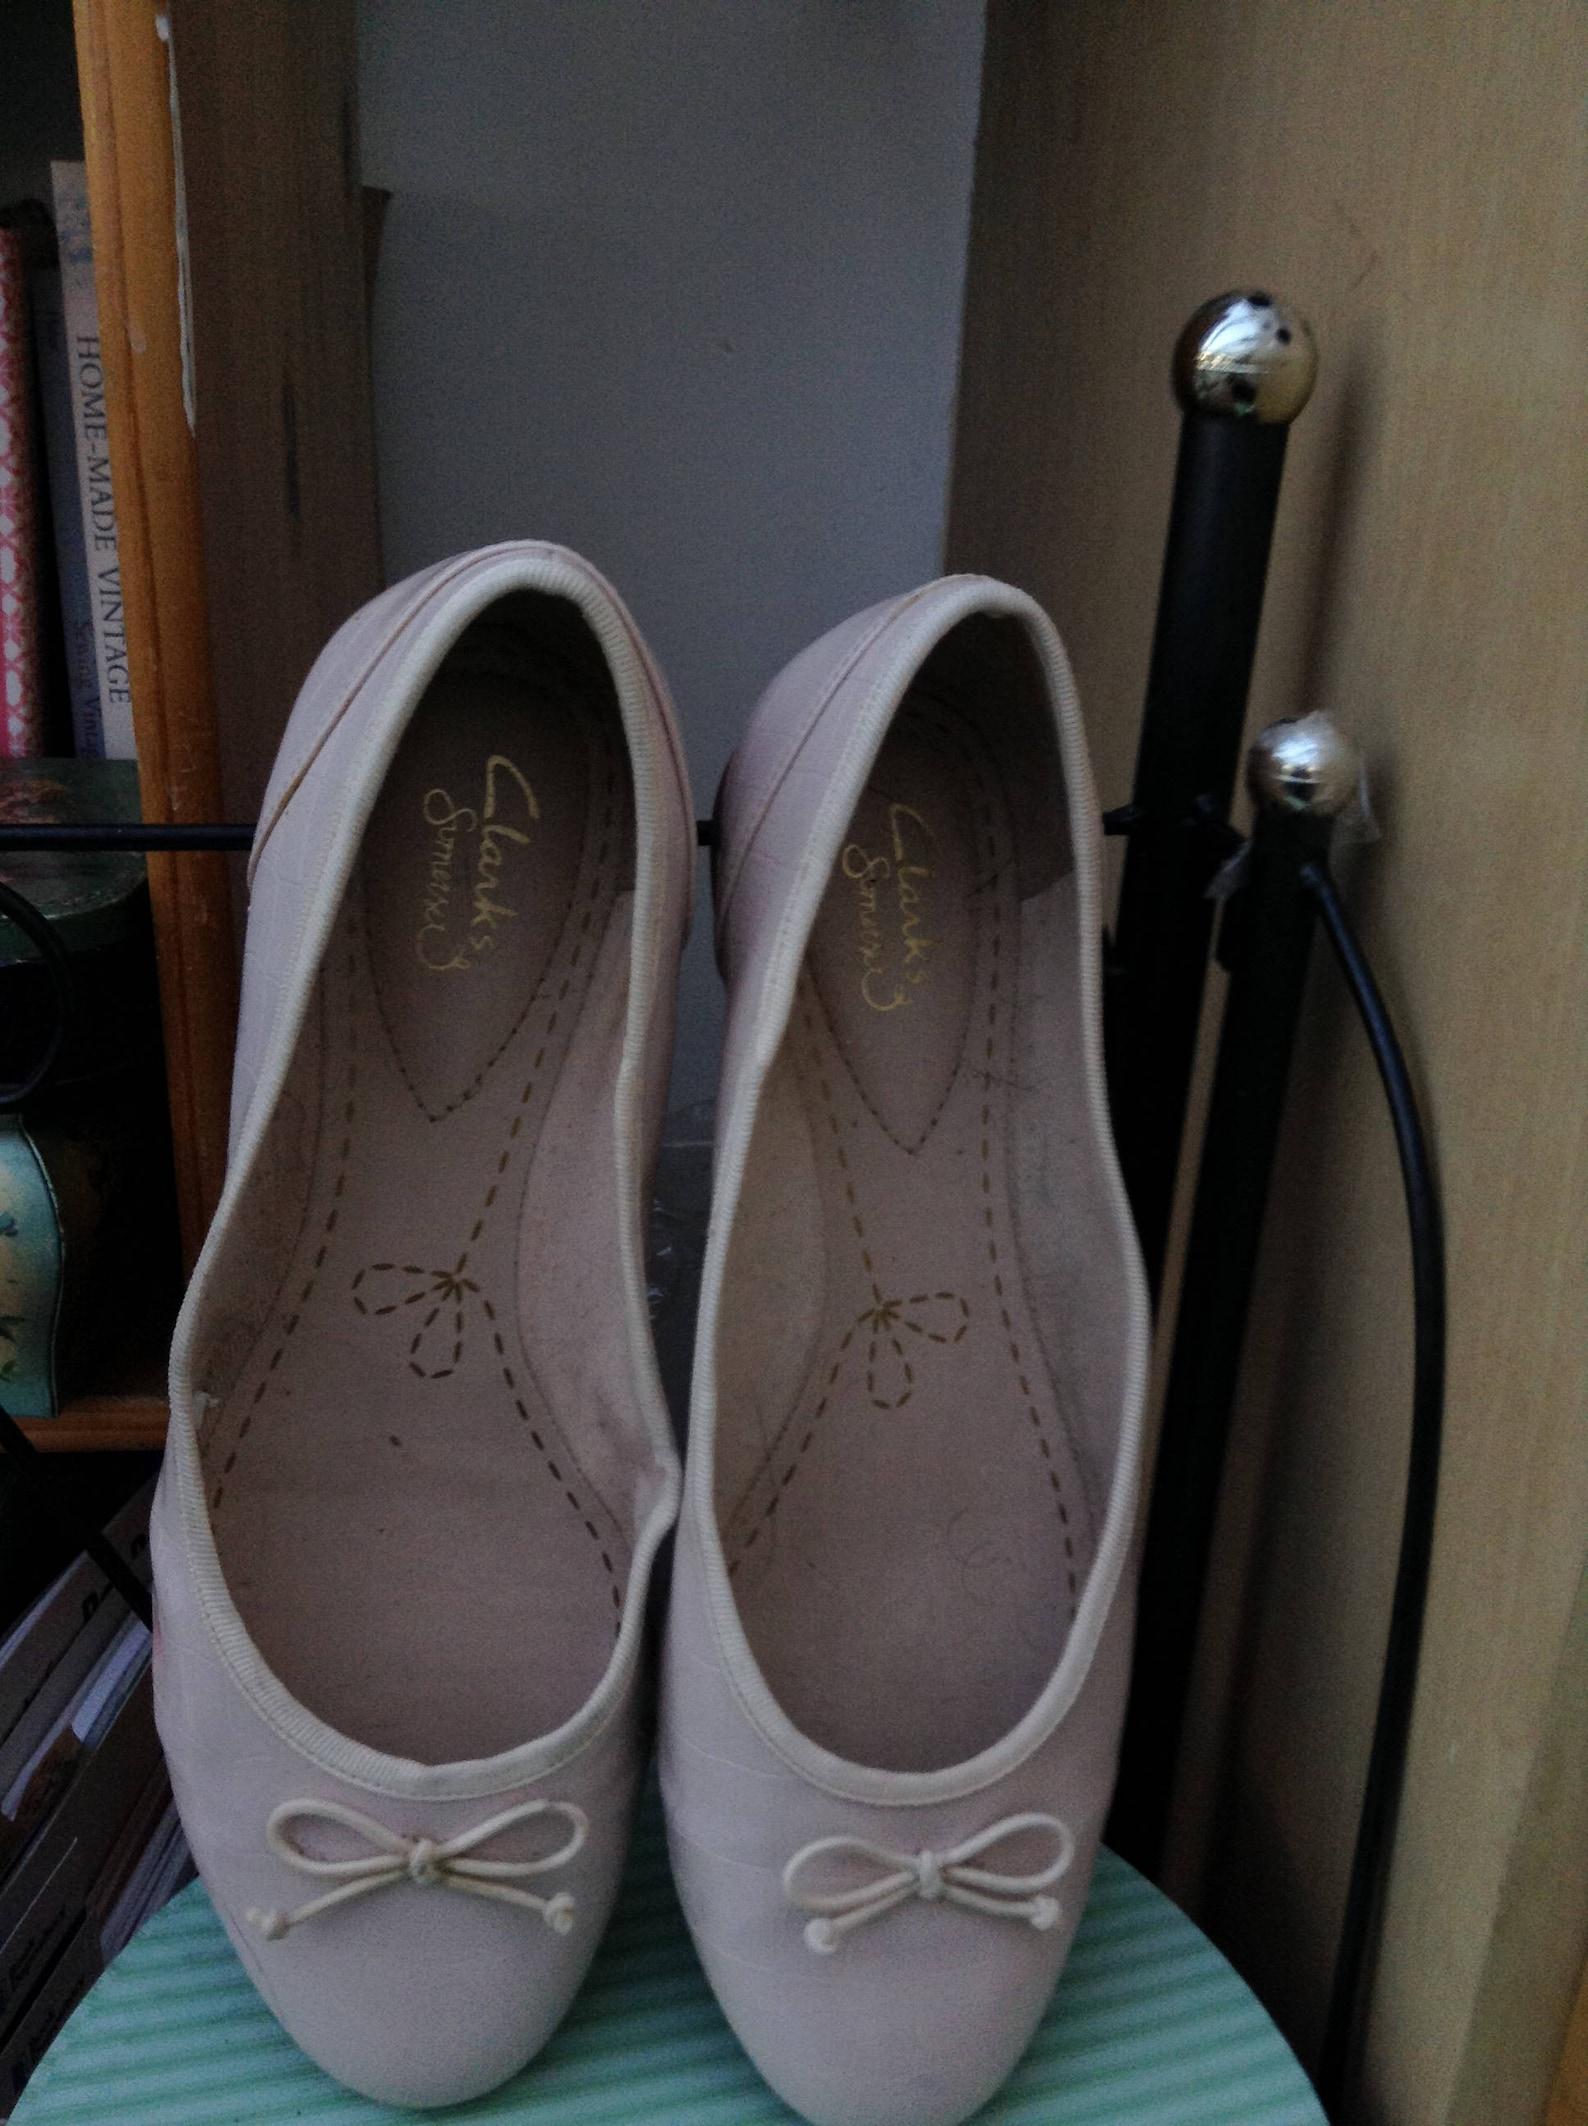 vintage clarke's ballet slip on shoes, flats, ballet flats. nude shoes, us 6.5 uk 4